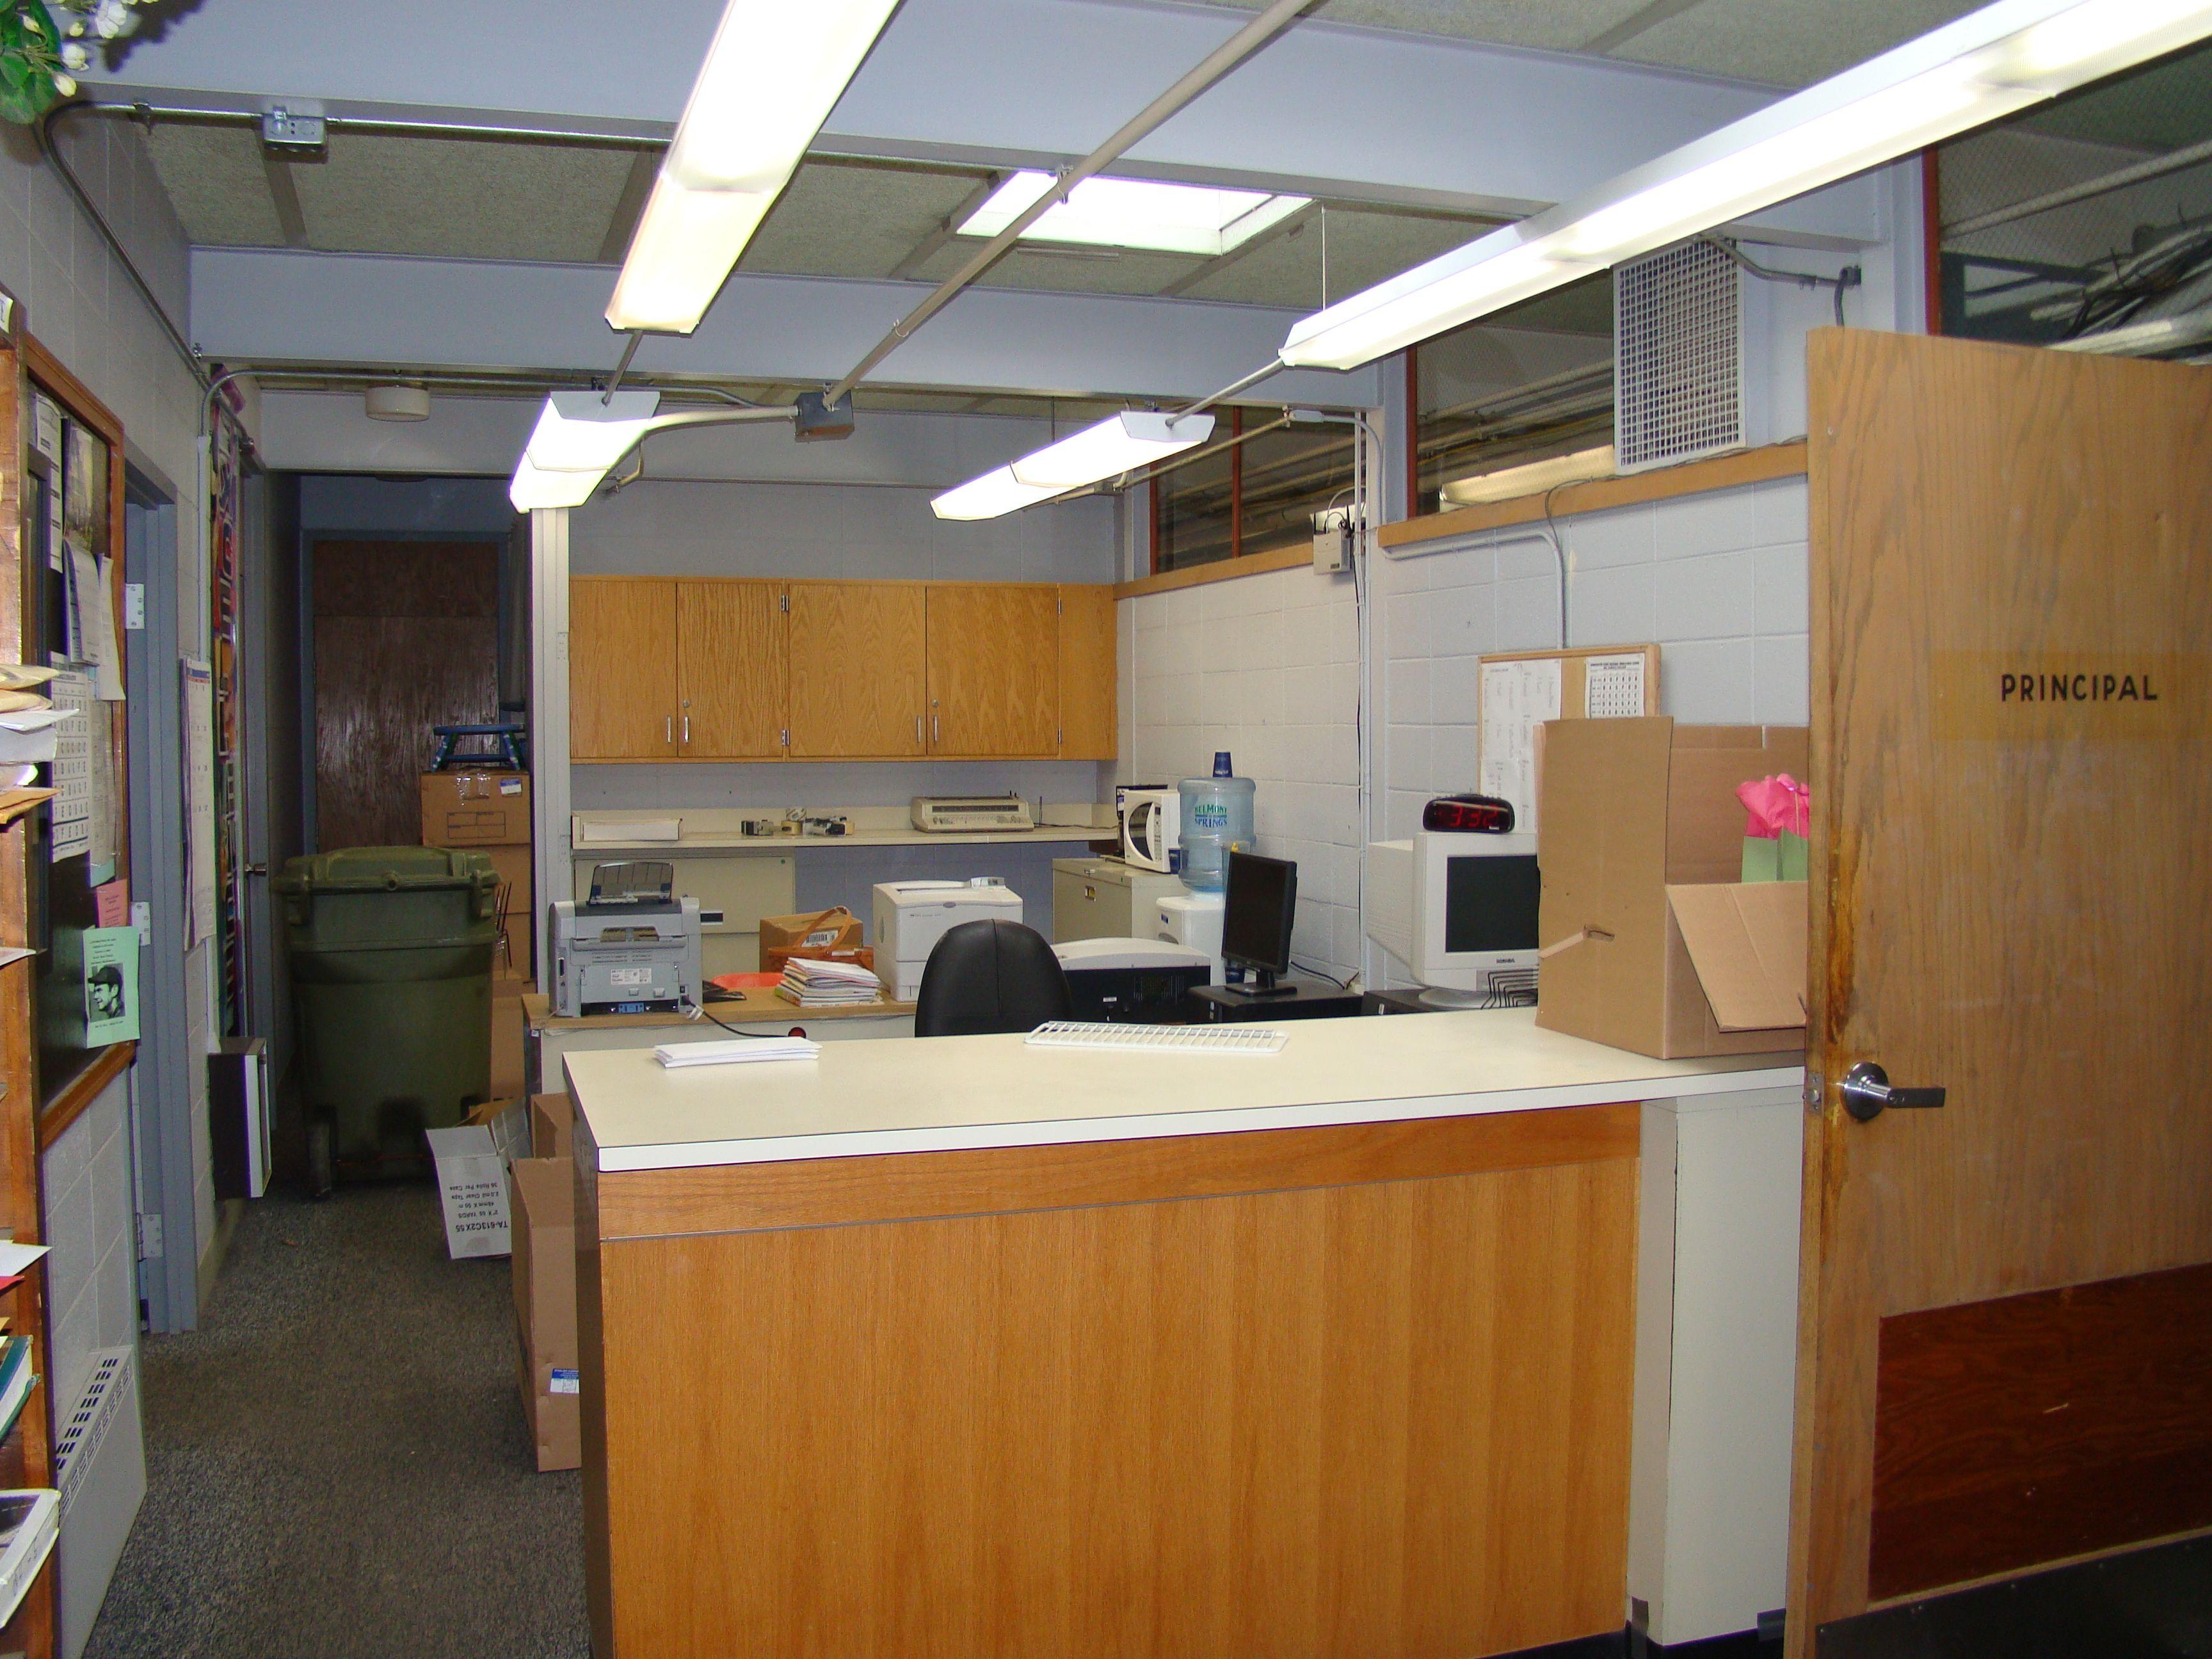 School Principal Office Interior Design Just B Cause